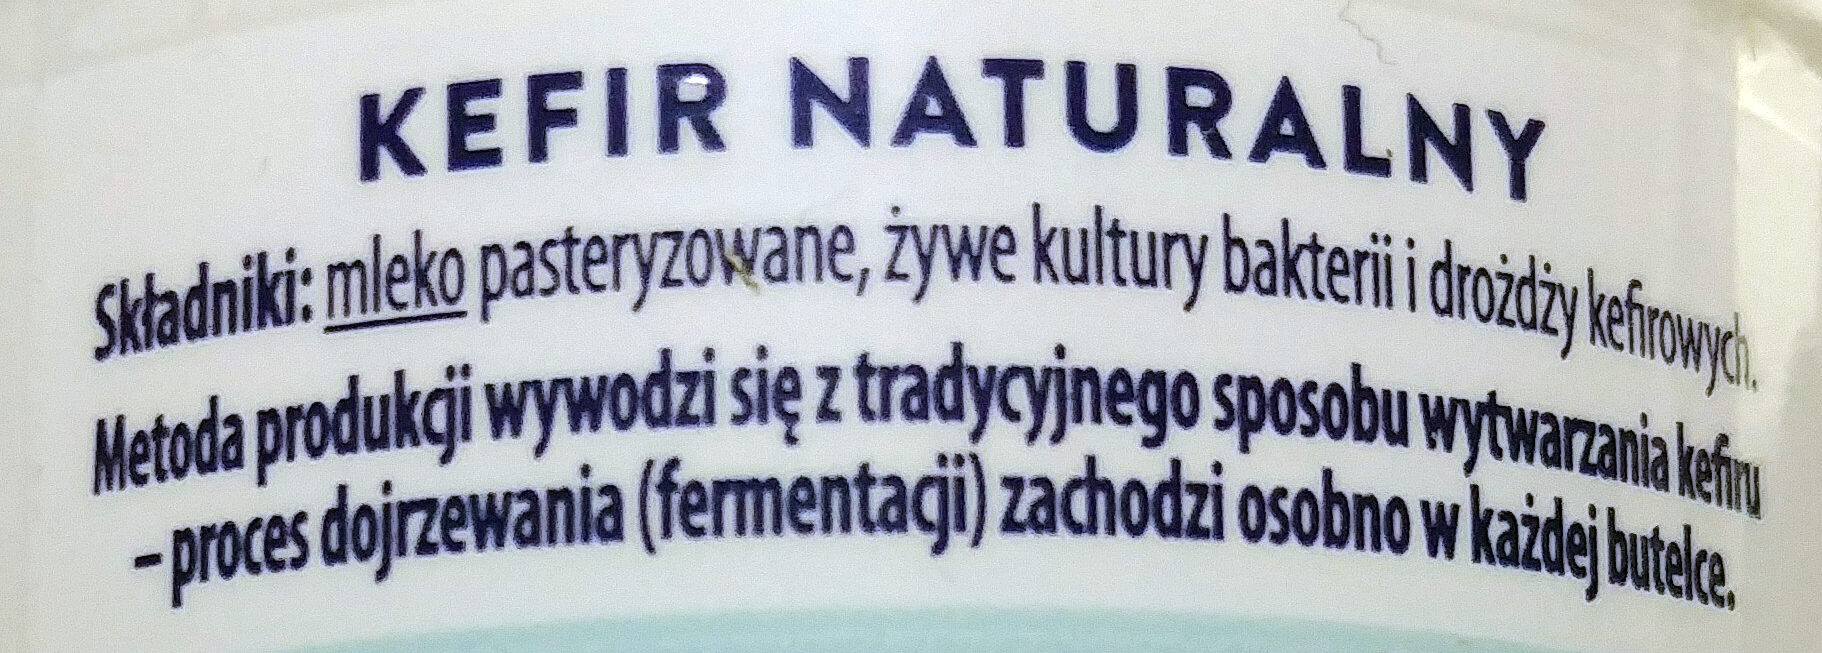 Kefir naturalny 1,5 % tłuszczu - Składniki - pl